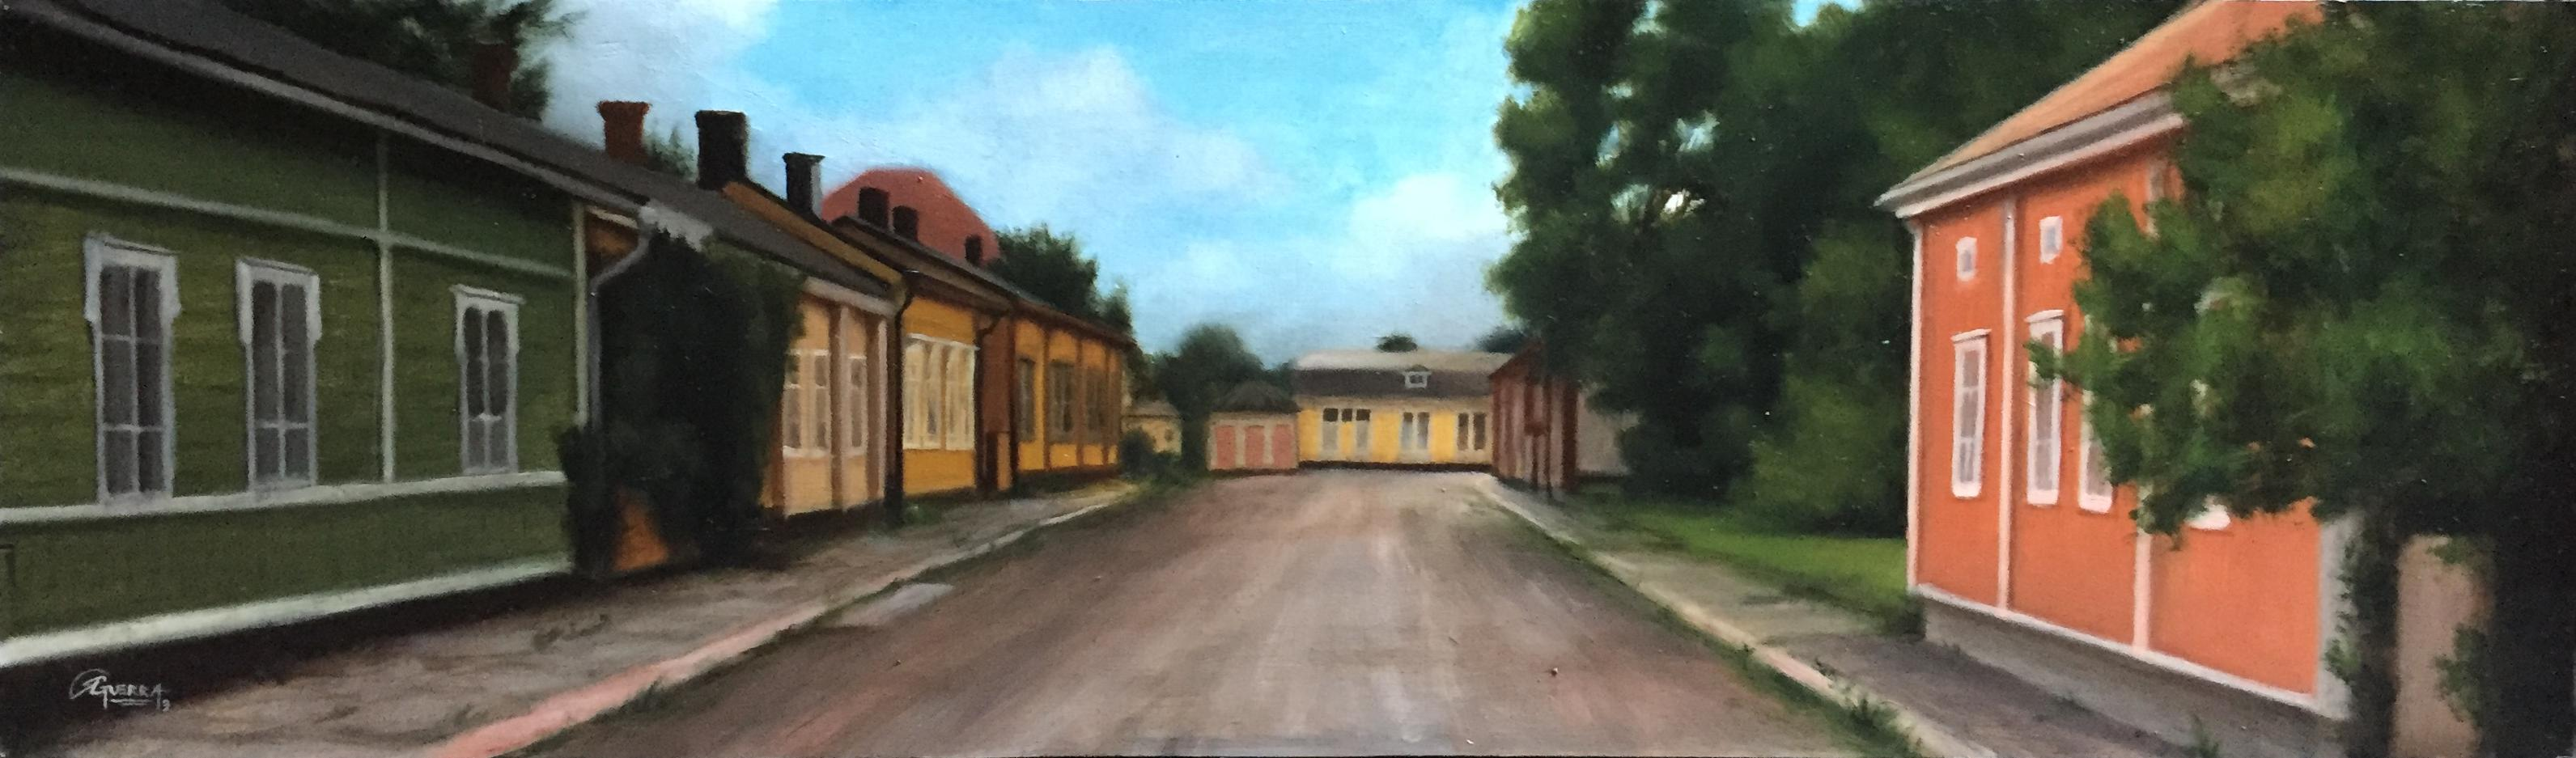 Loviisan Vanhat Talot 1, Rafael Guerra Painting